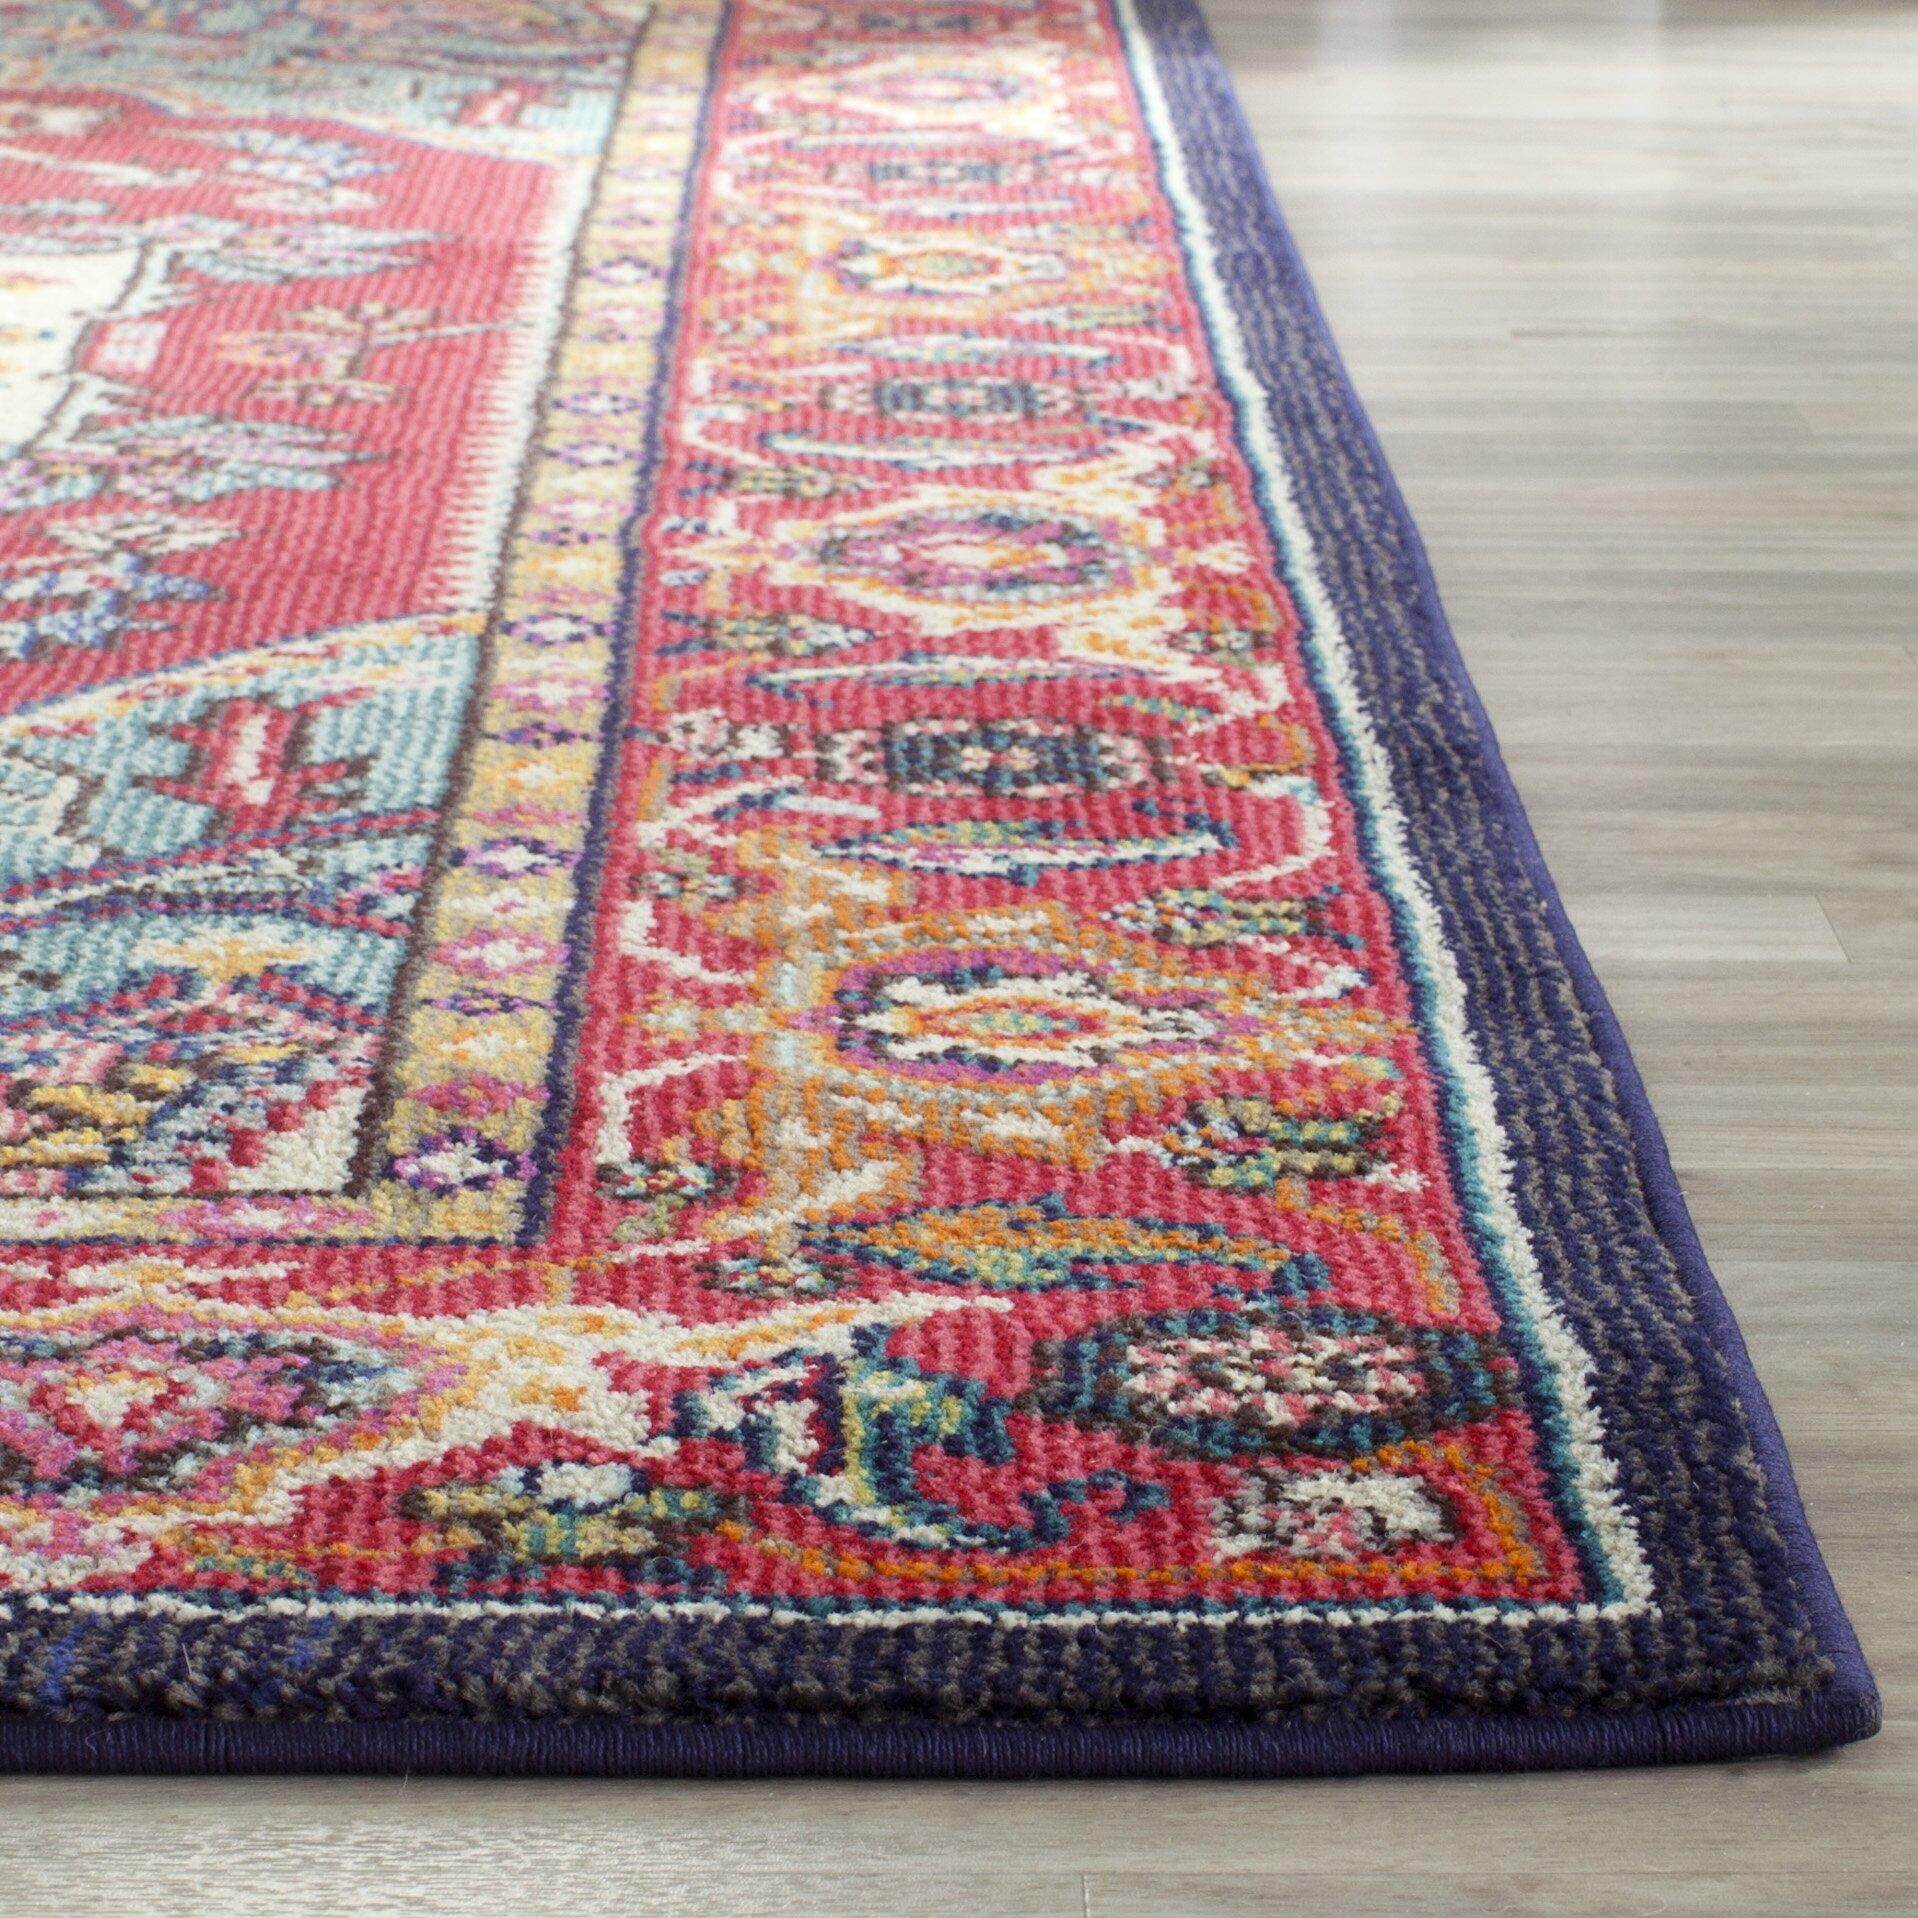 safavieh monaco emiliana red turquoise area rug reviews wayfair uk. Black Bedroom Furniture Sets. Home Design Ideas